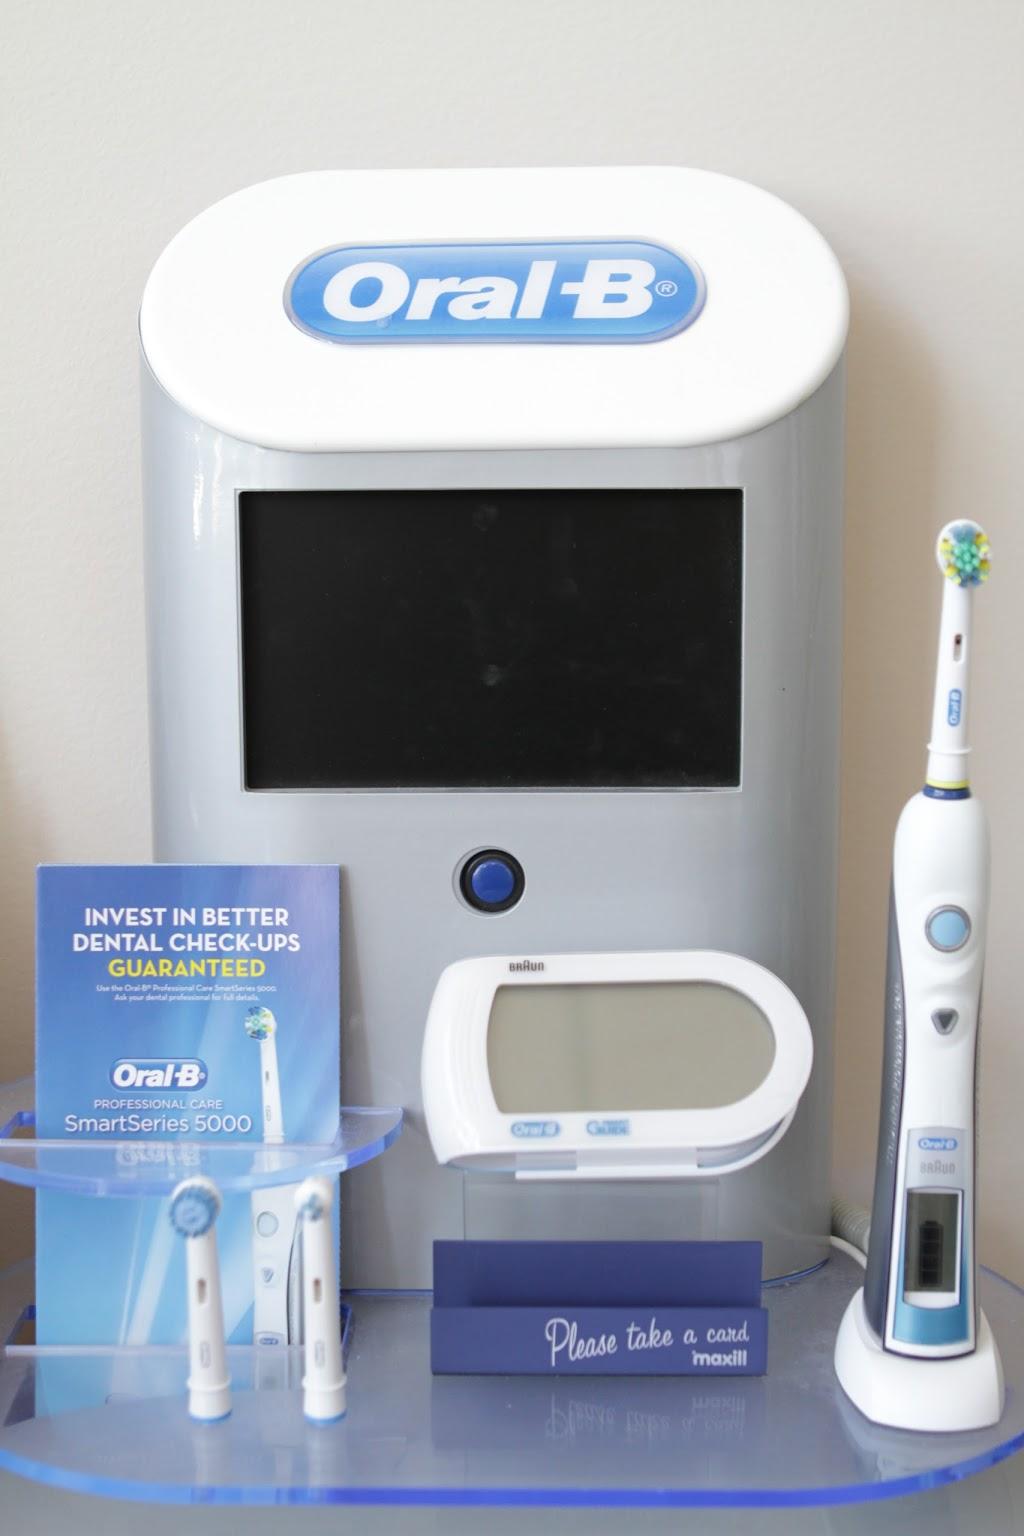 Southern Community Dental Care | dentist | 2725 Pembina Hwy, Winnipeg, MB R3T 2H5, Canada | 2043383384 OR +1 204-338-3384